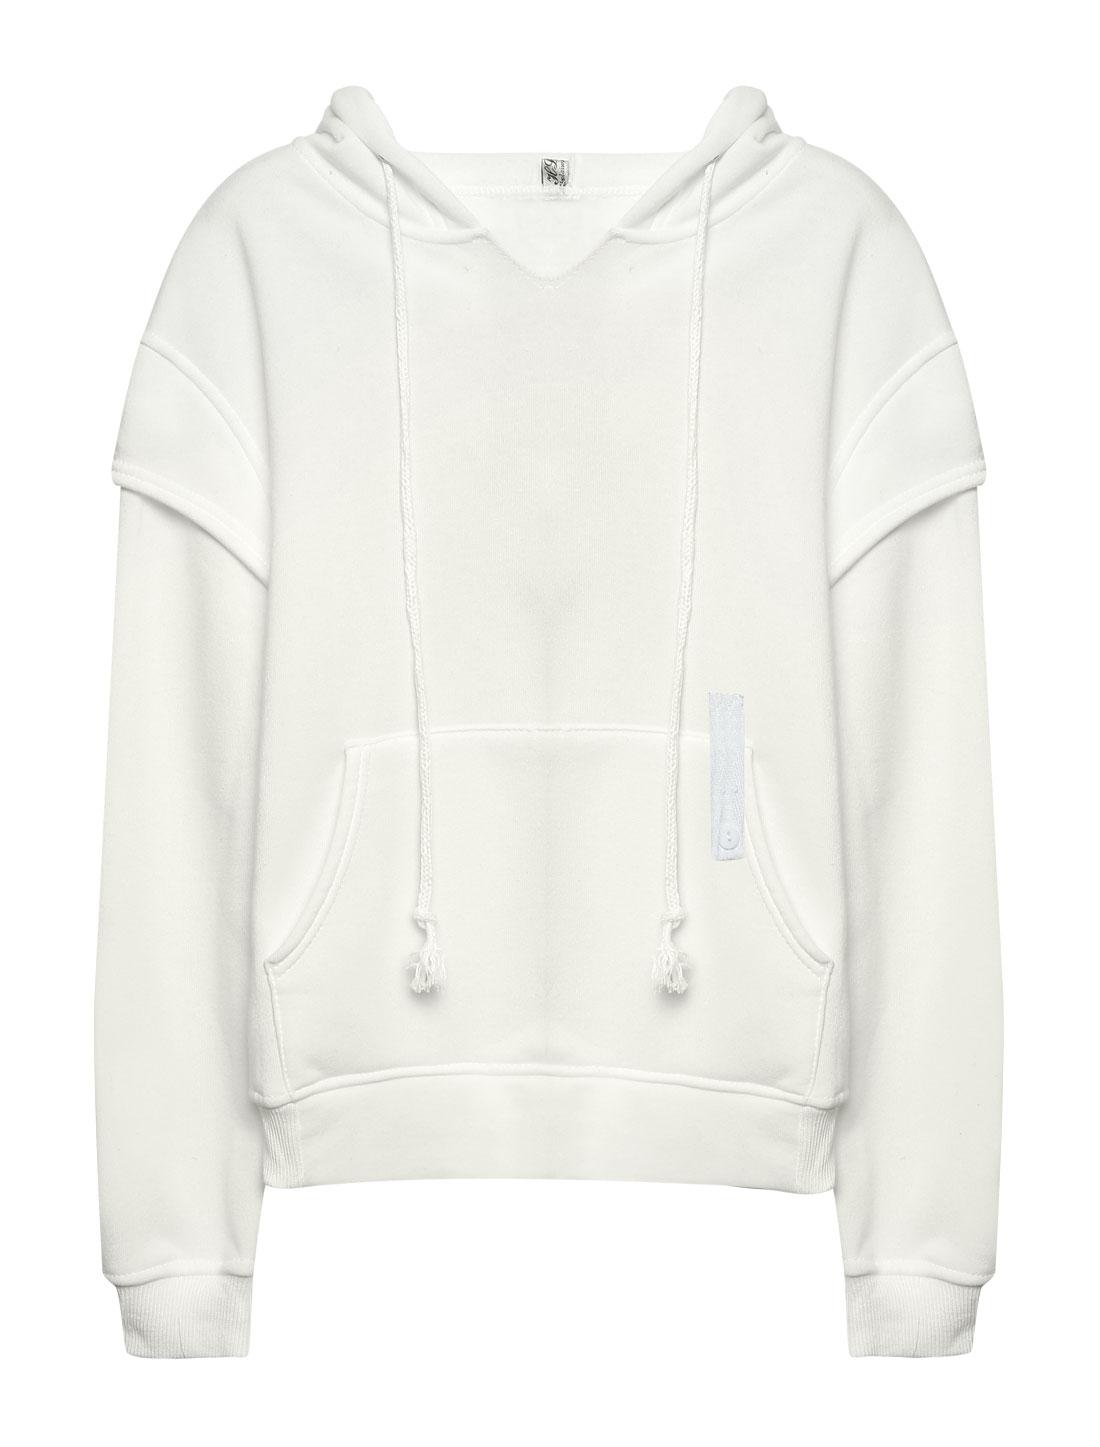 Women Kangaroo Pocket Embroidered Letters Drawstring Hoodie White XS